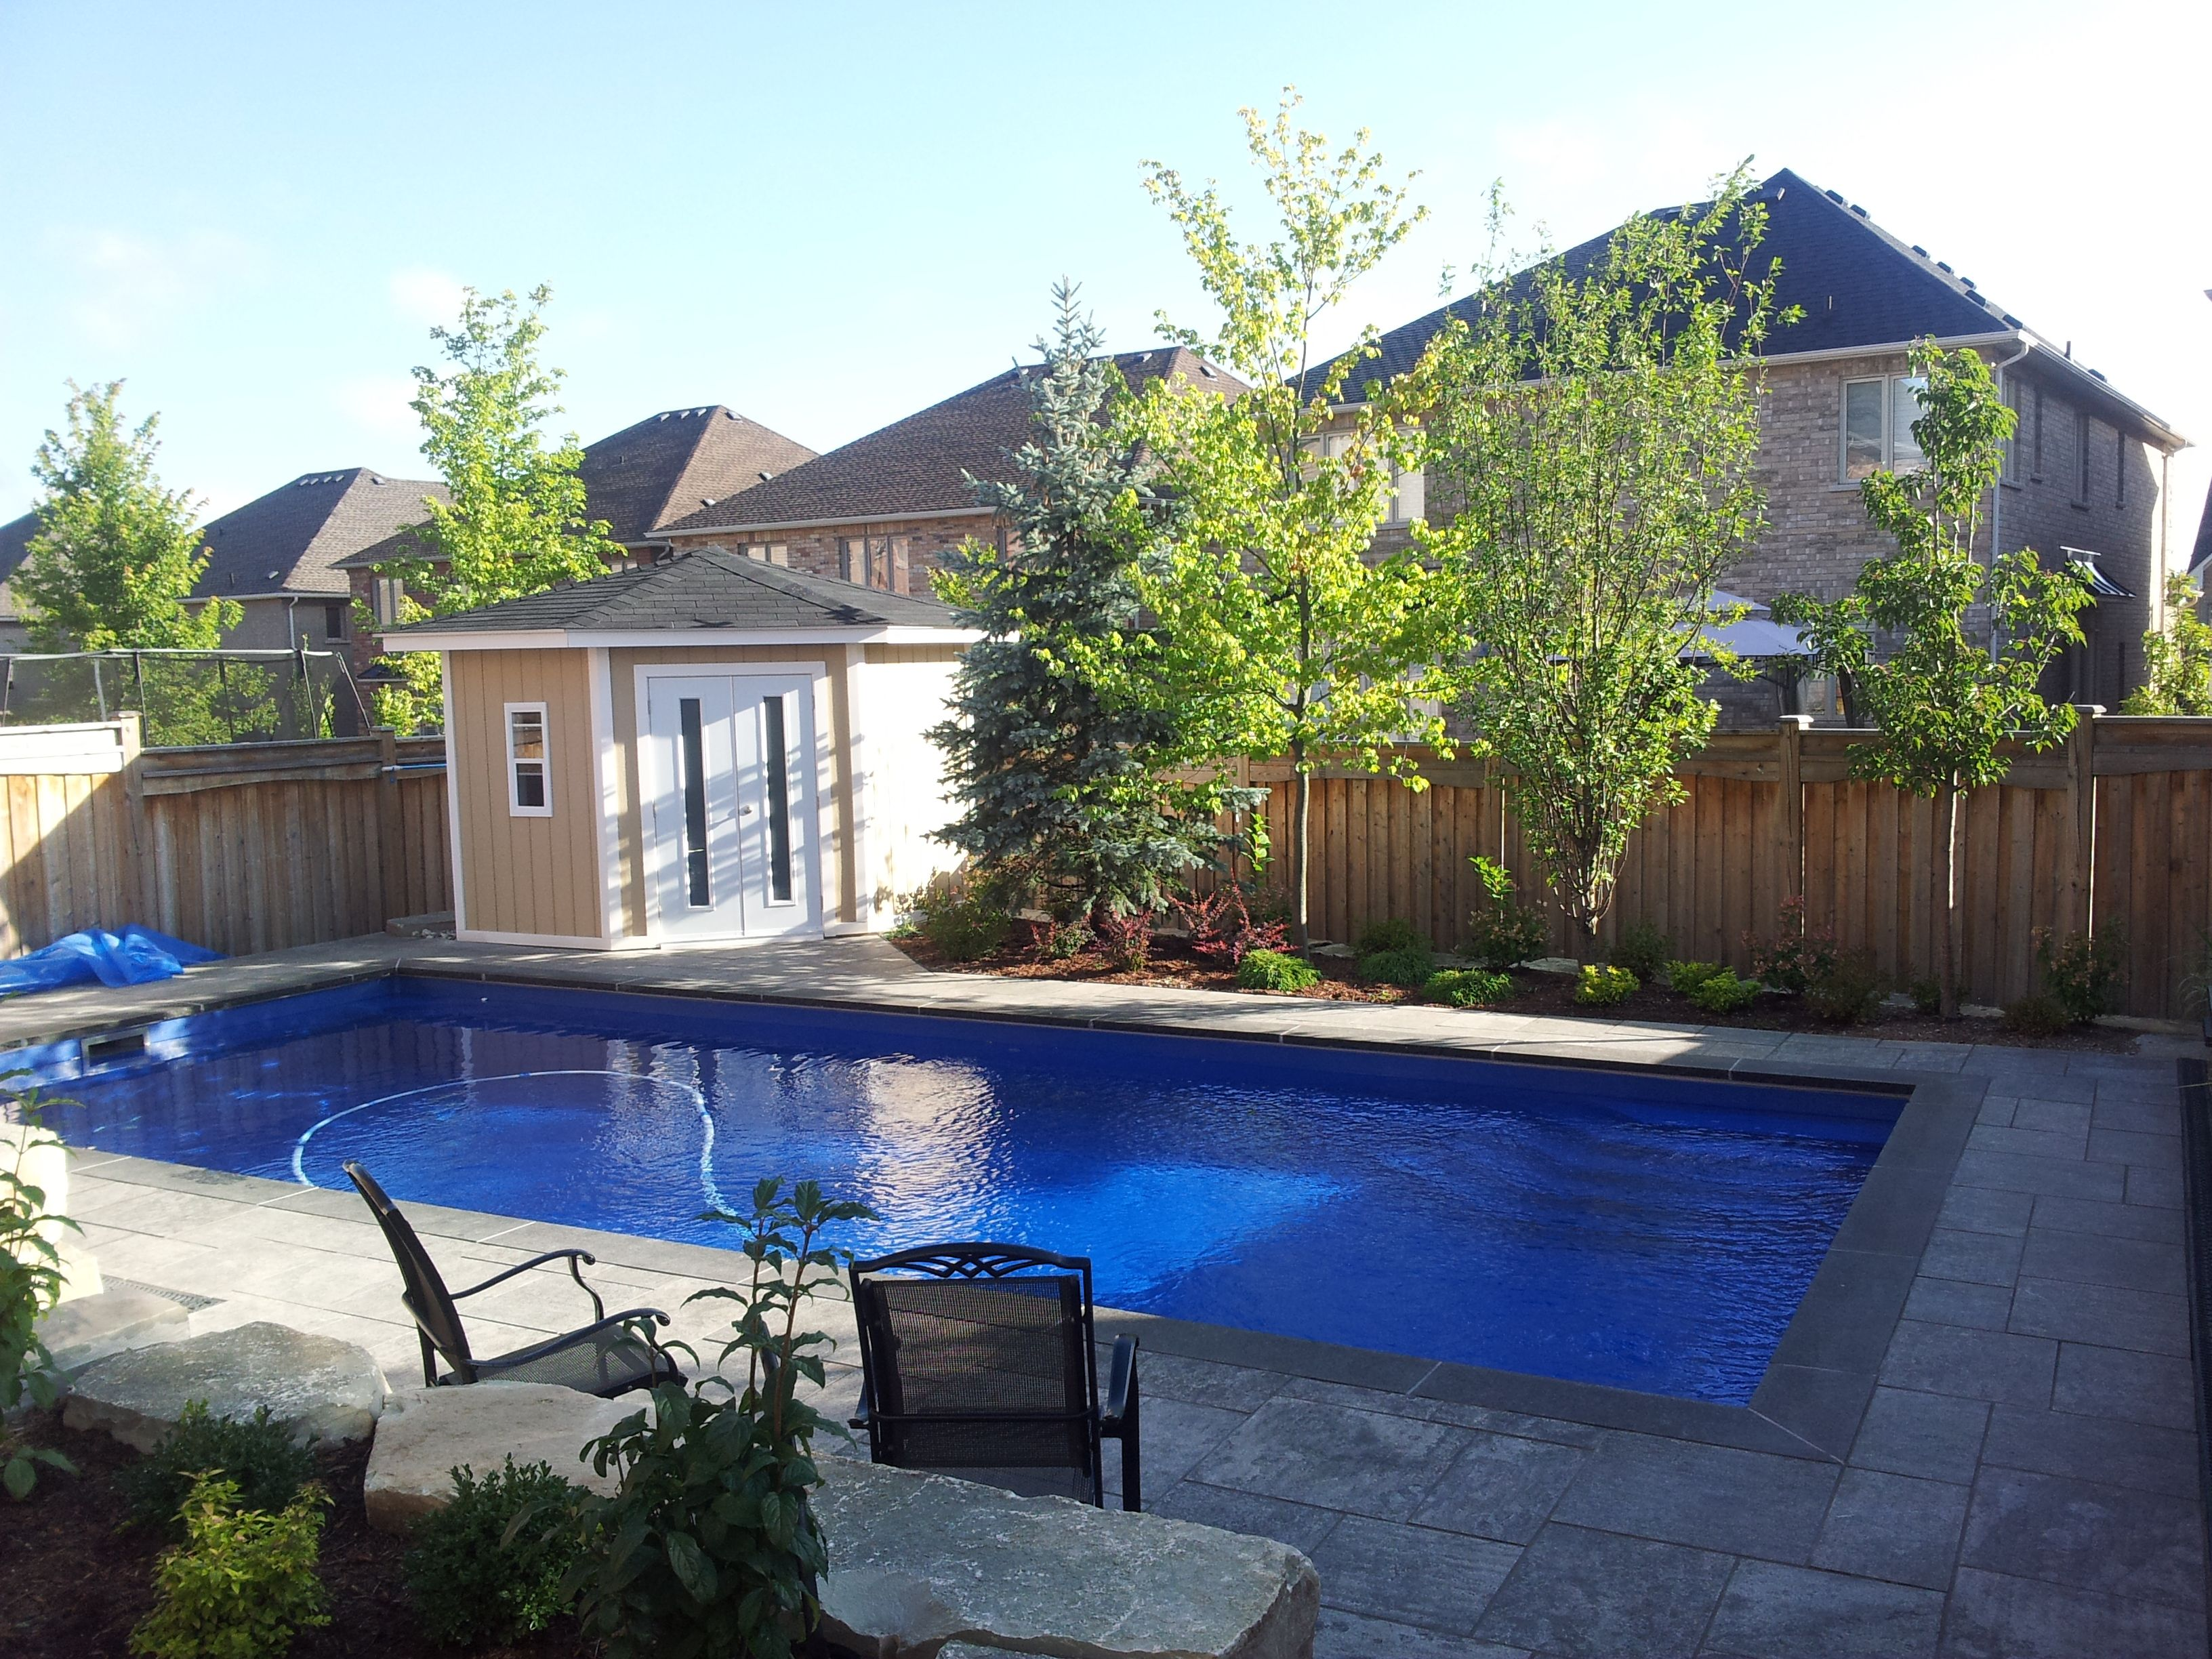 Pools 4 Ever Rectangle Pool Fiberglass Swimming Pools Pool Builders